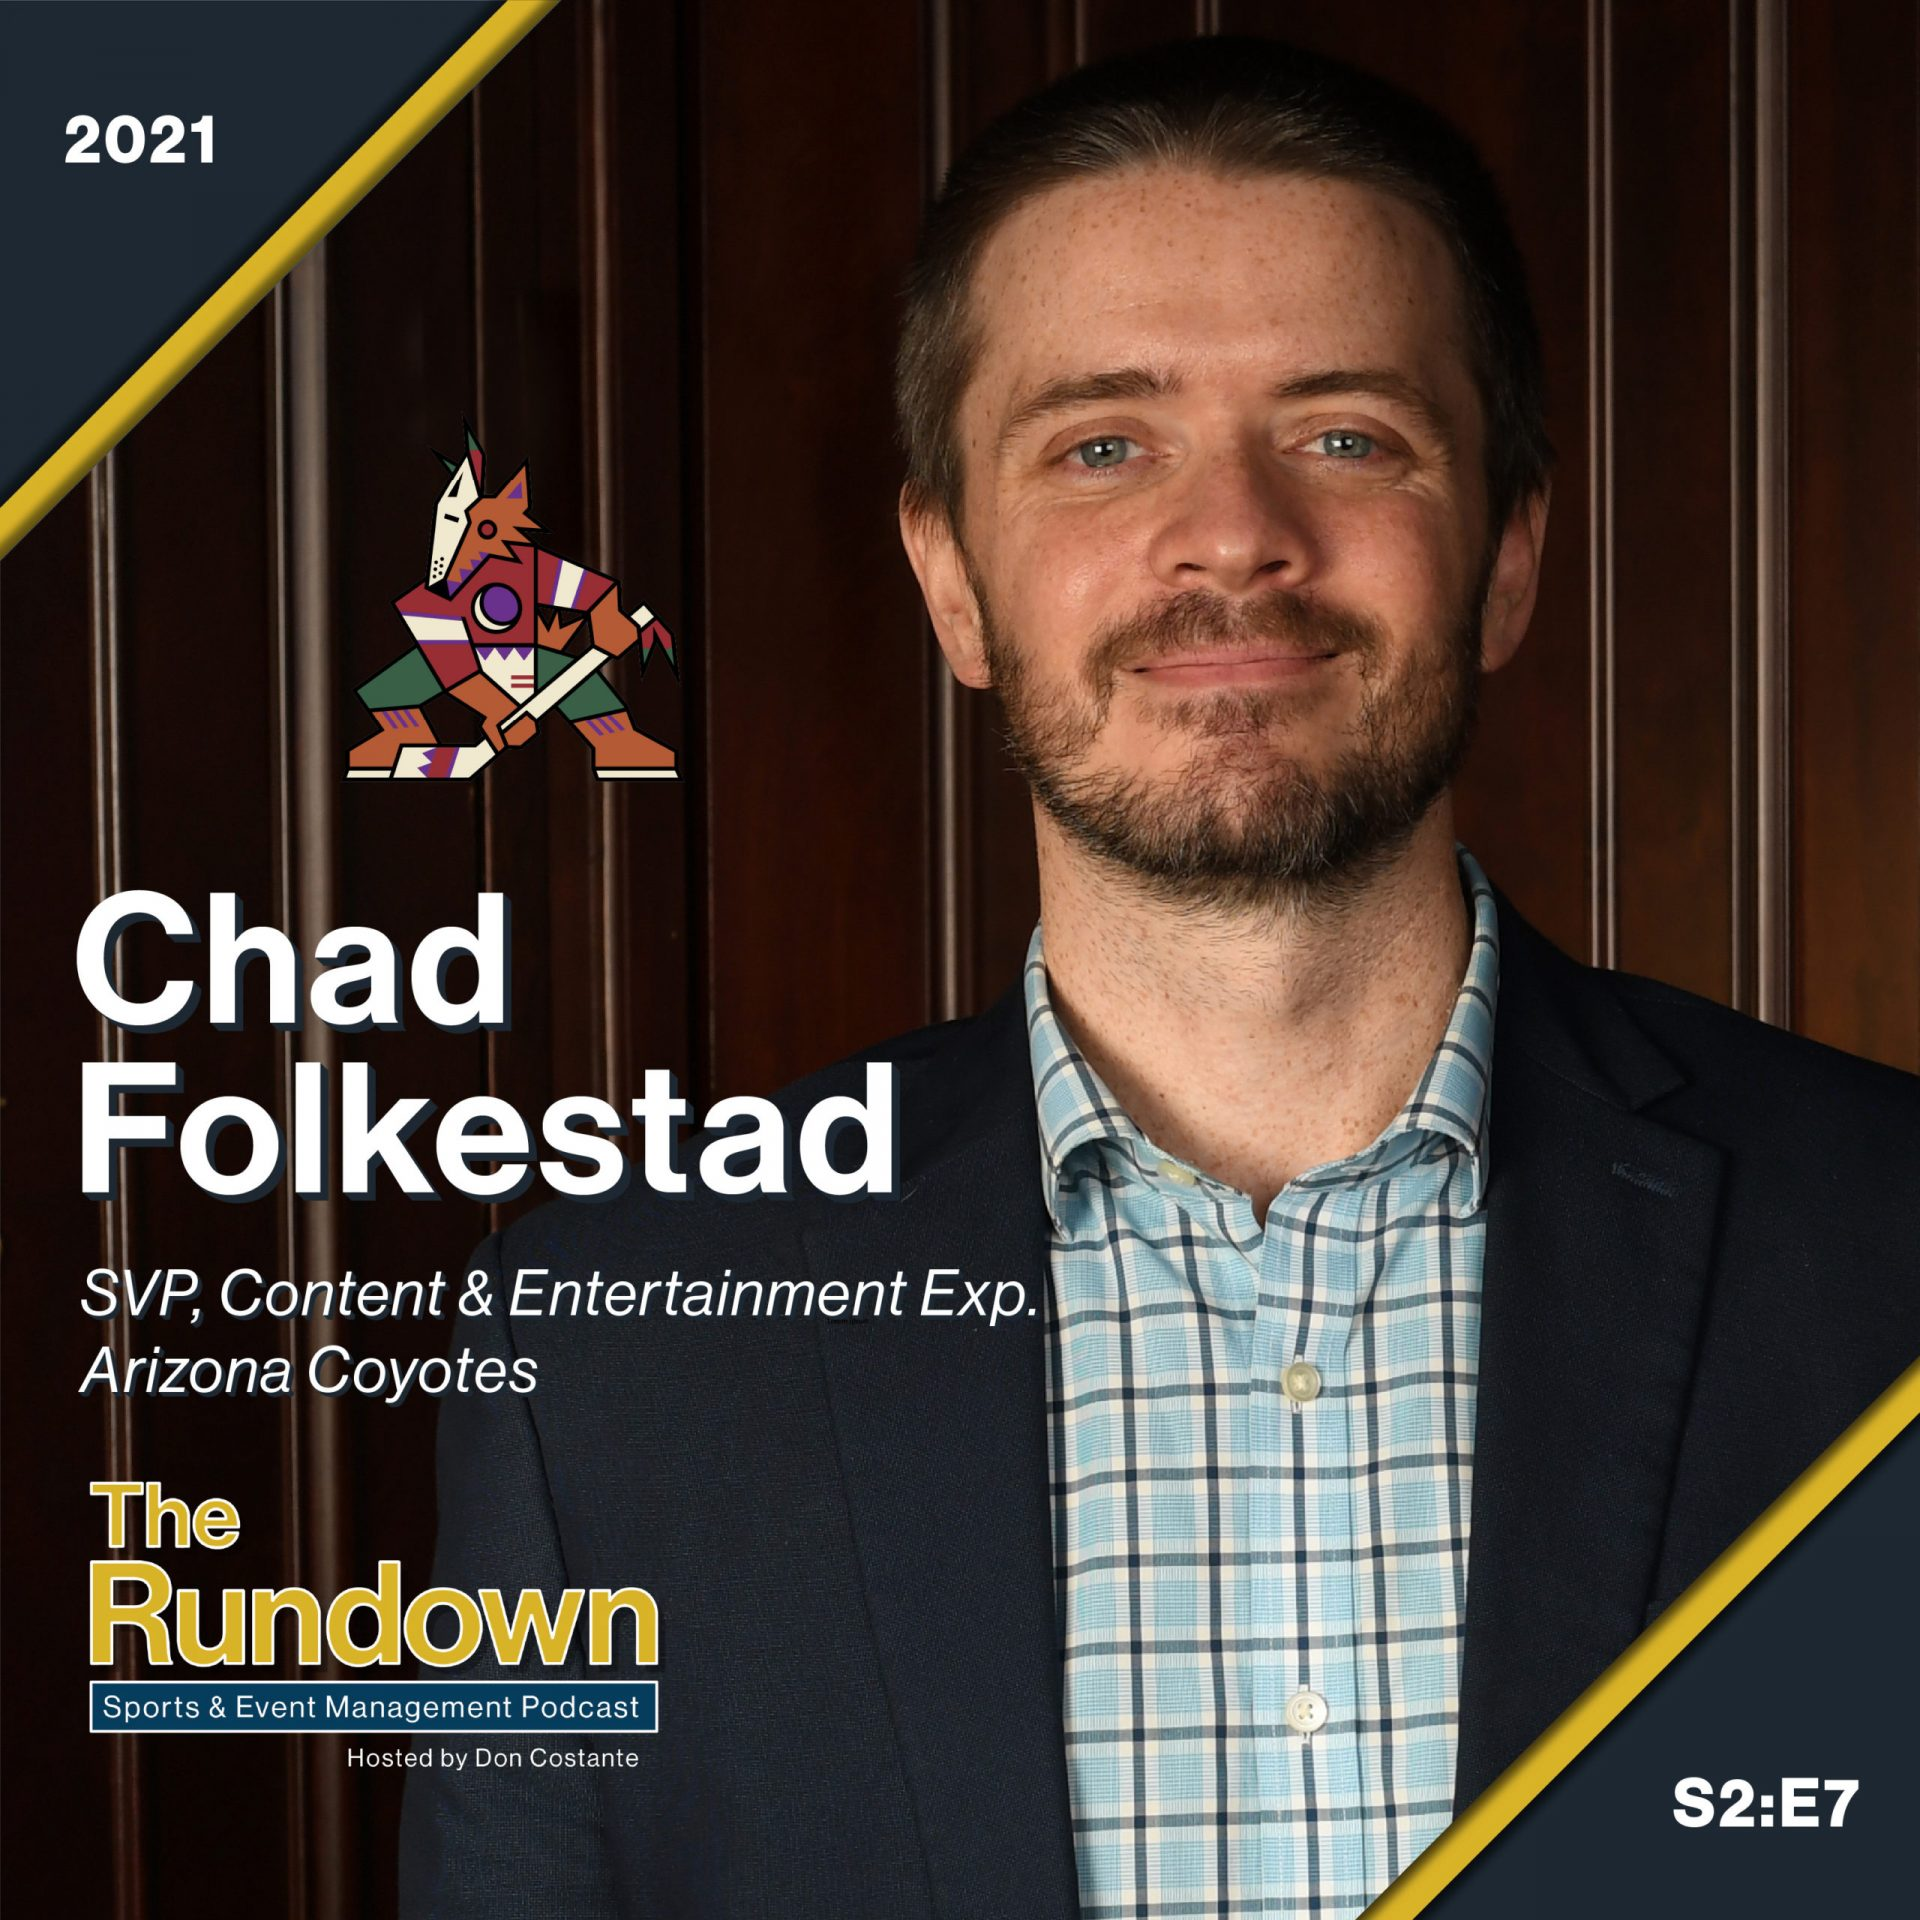 Chad Folkestad